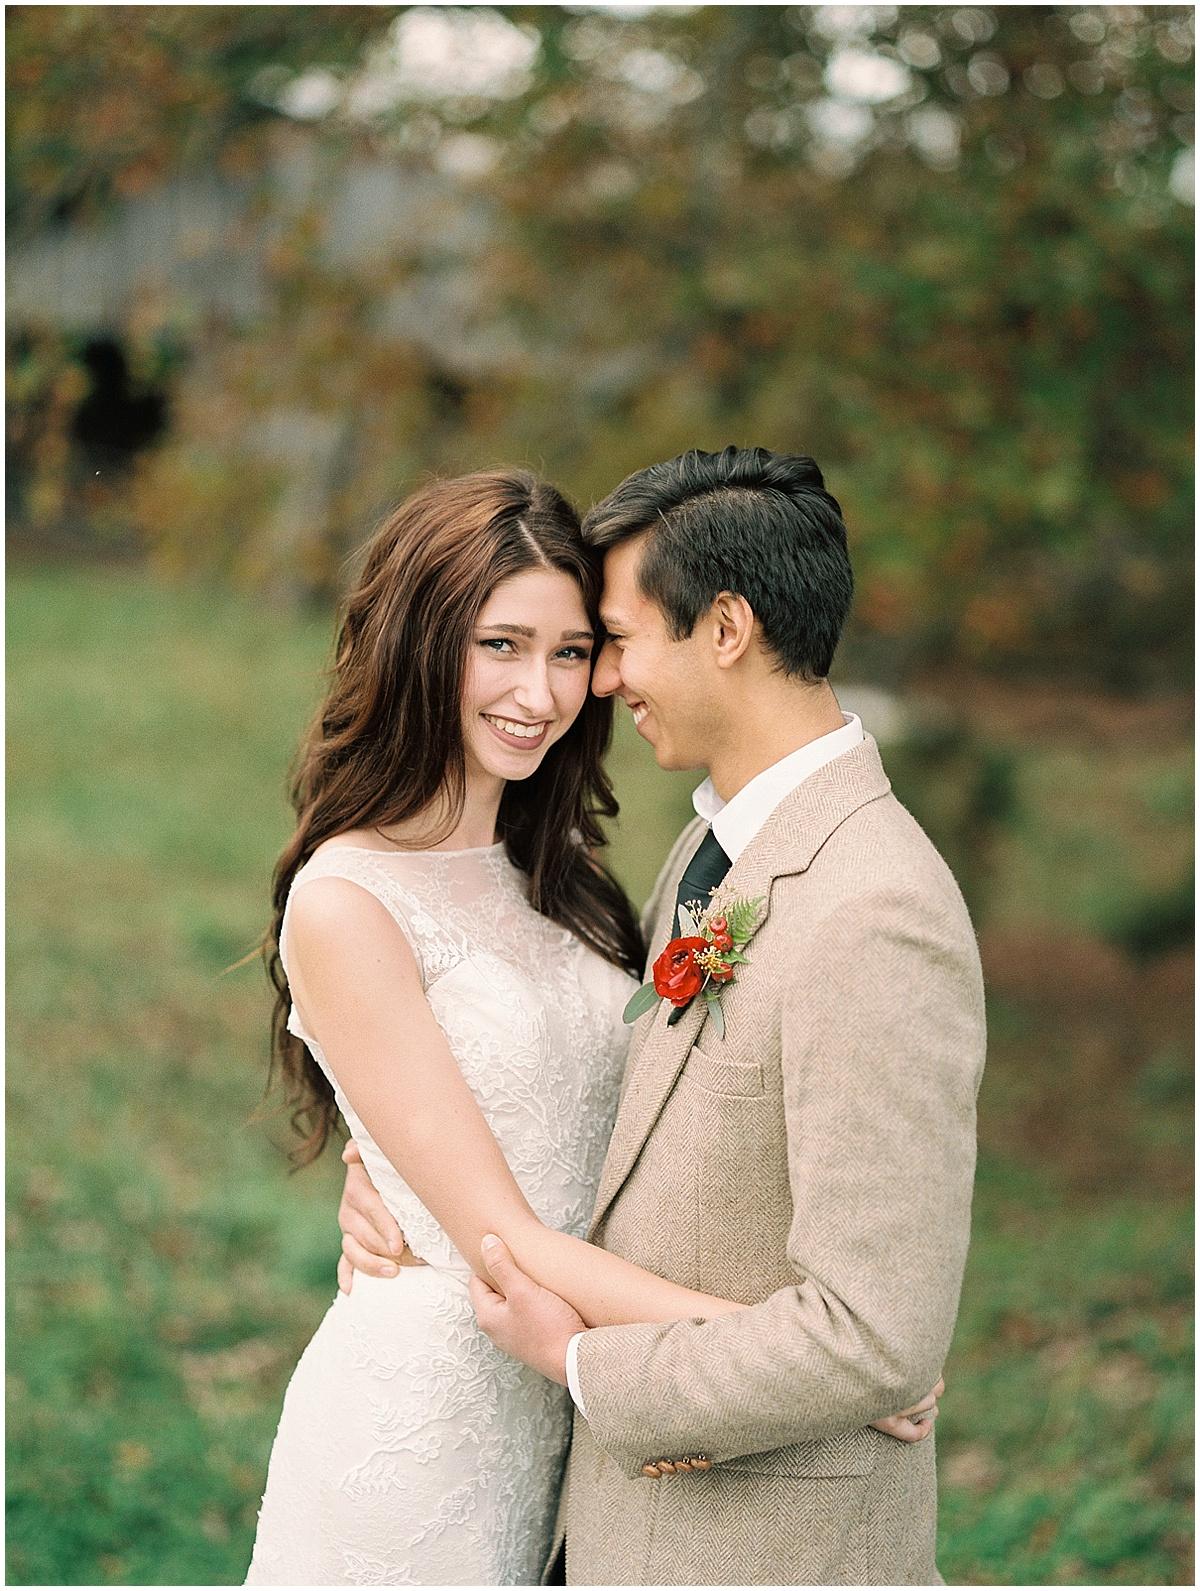 Abigail_Malone_Fall_Wedding_Knoxville_Film_Portra_400_Kodak_Mountain_Views_Abby_Elizabeth-61.jpg